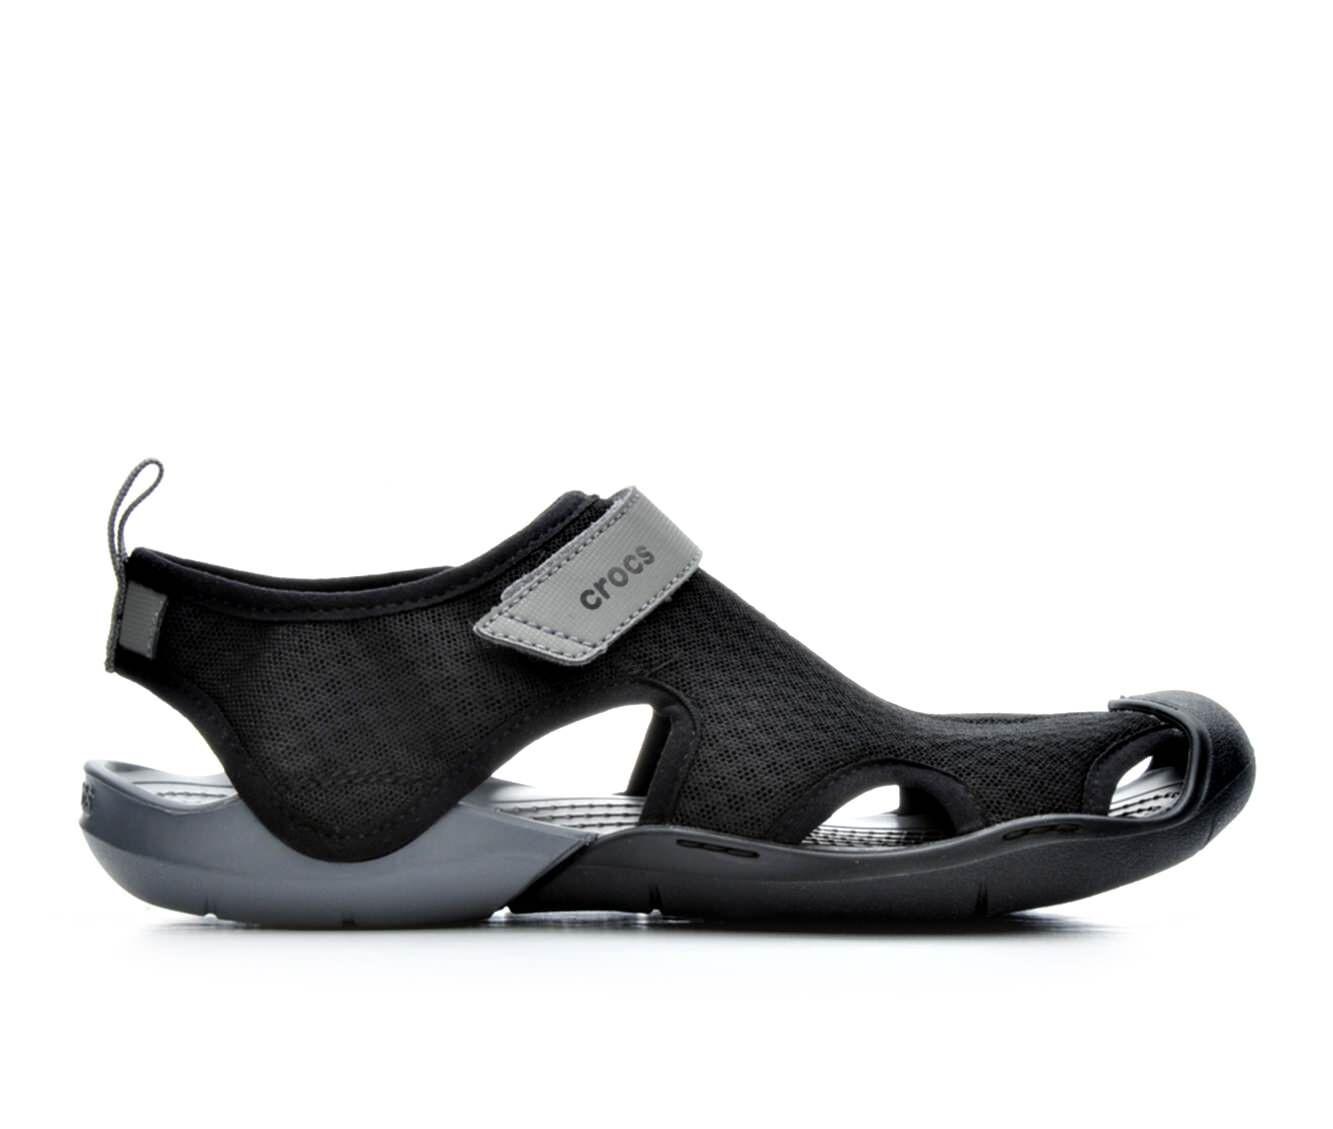 Sunshine Men Crocs Swiftwater Sandal Brown/Black - H2H3335403